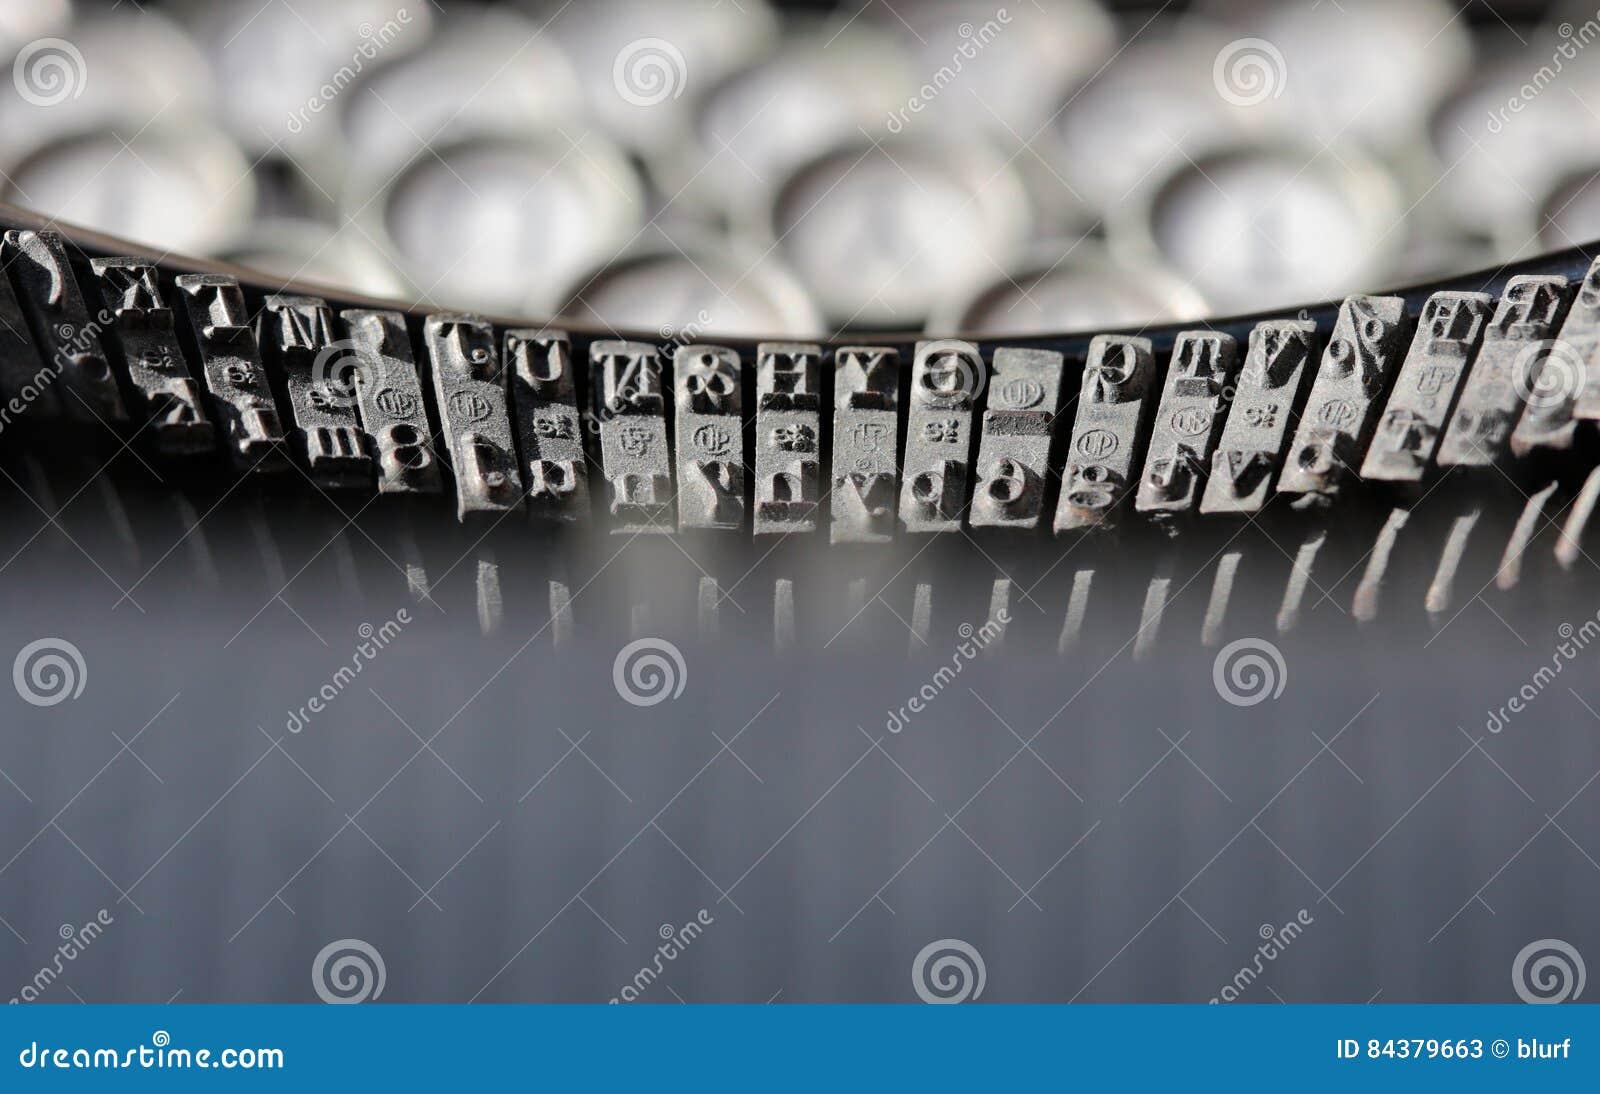 Antikviteten keys skrivmaskinen